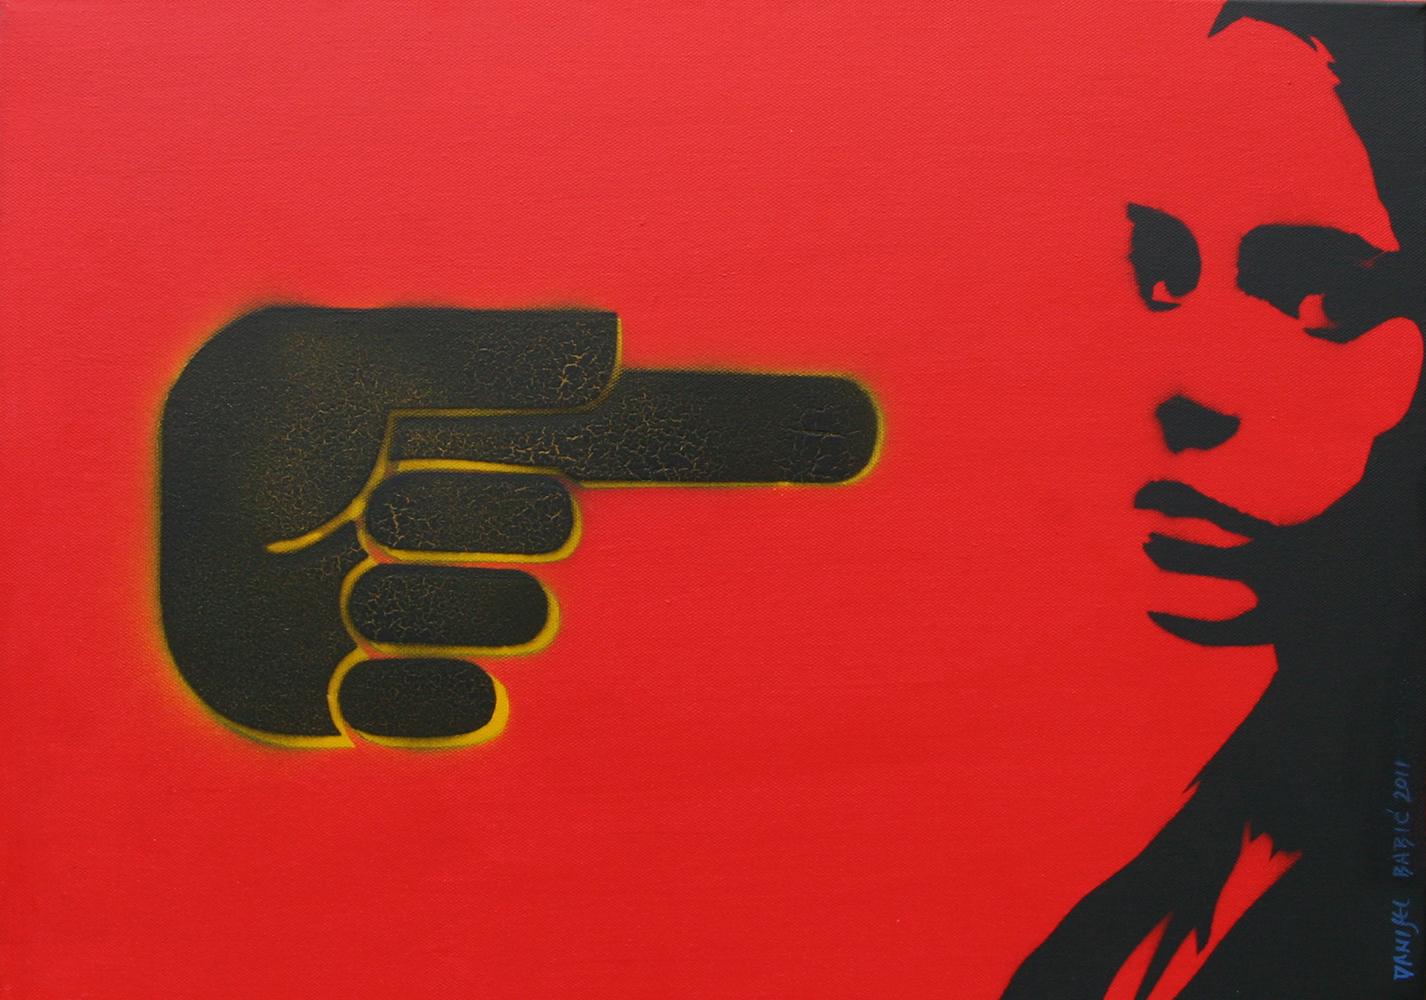 No title, 2011, 35x50 cm, acrylic & spray on canvas